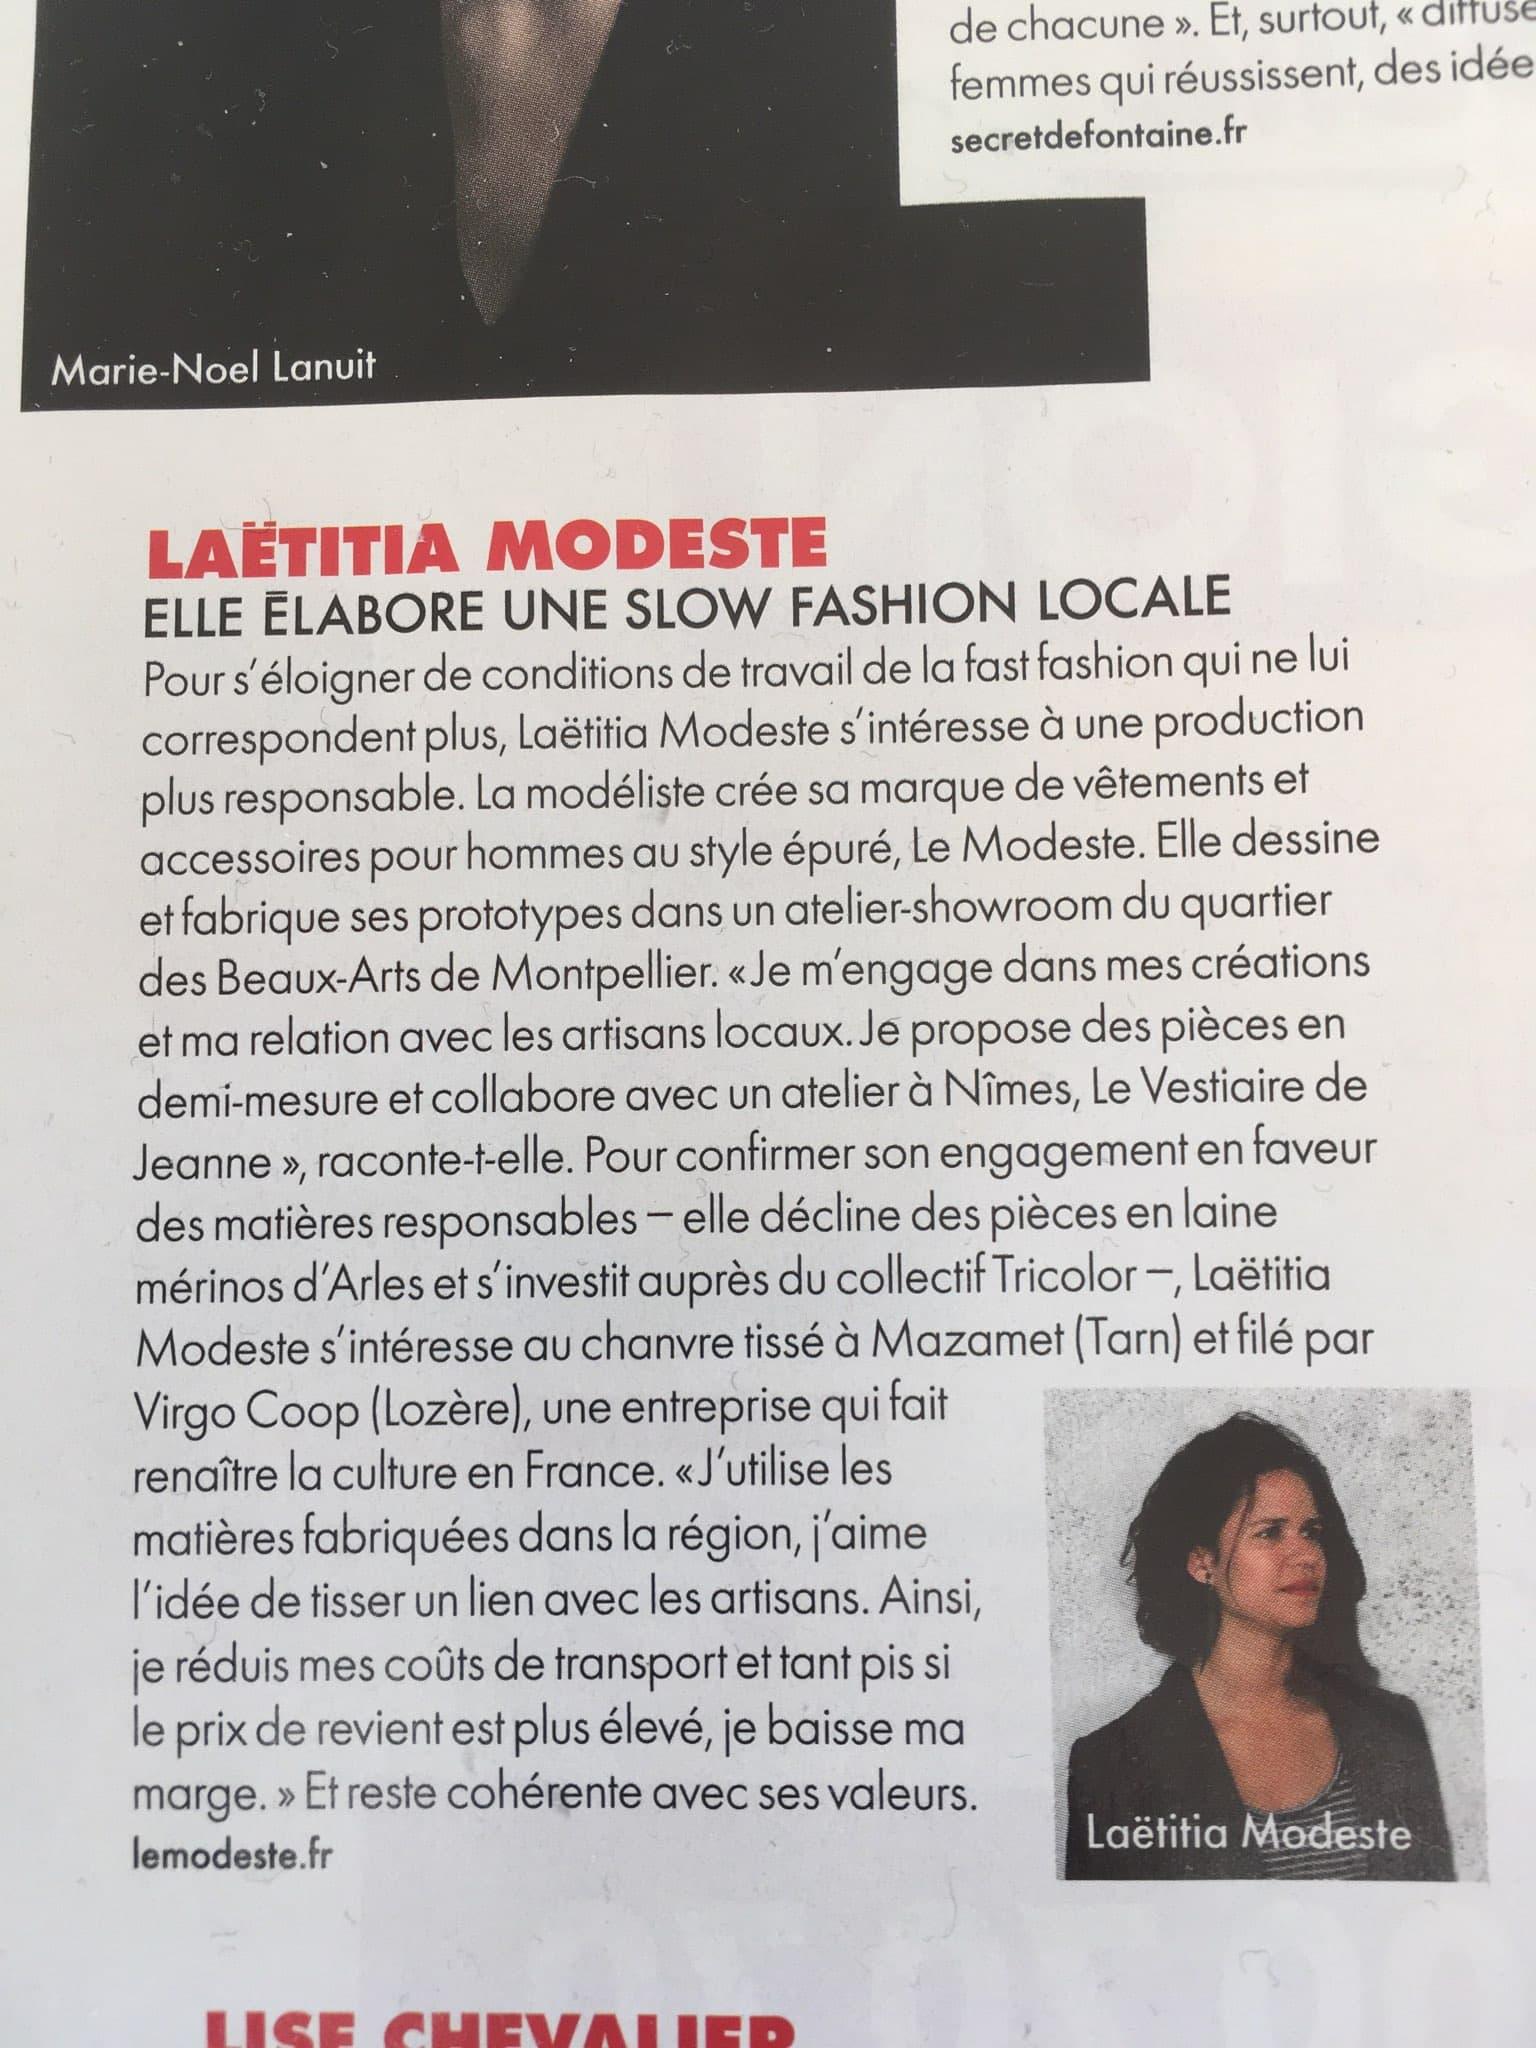 Article magazine ELLE sur Laetitia Modeste